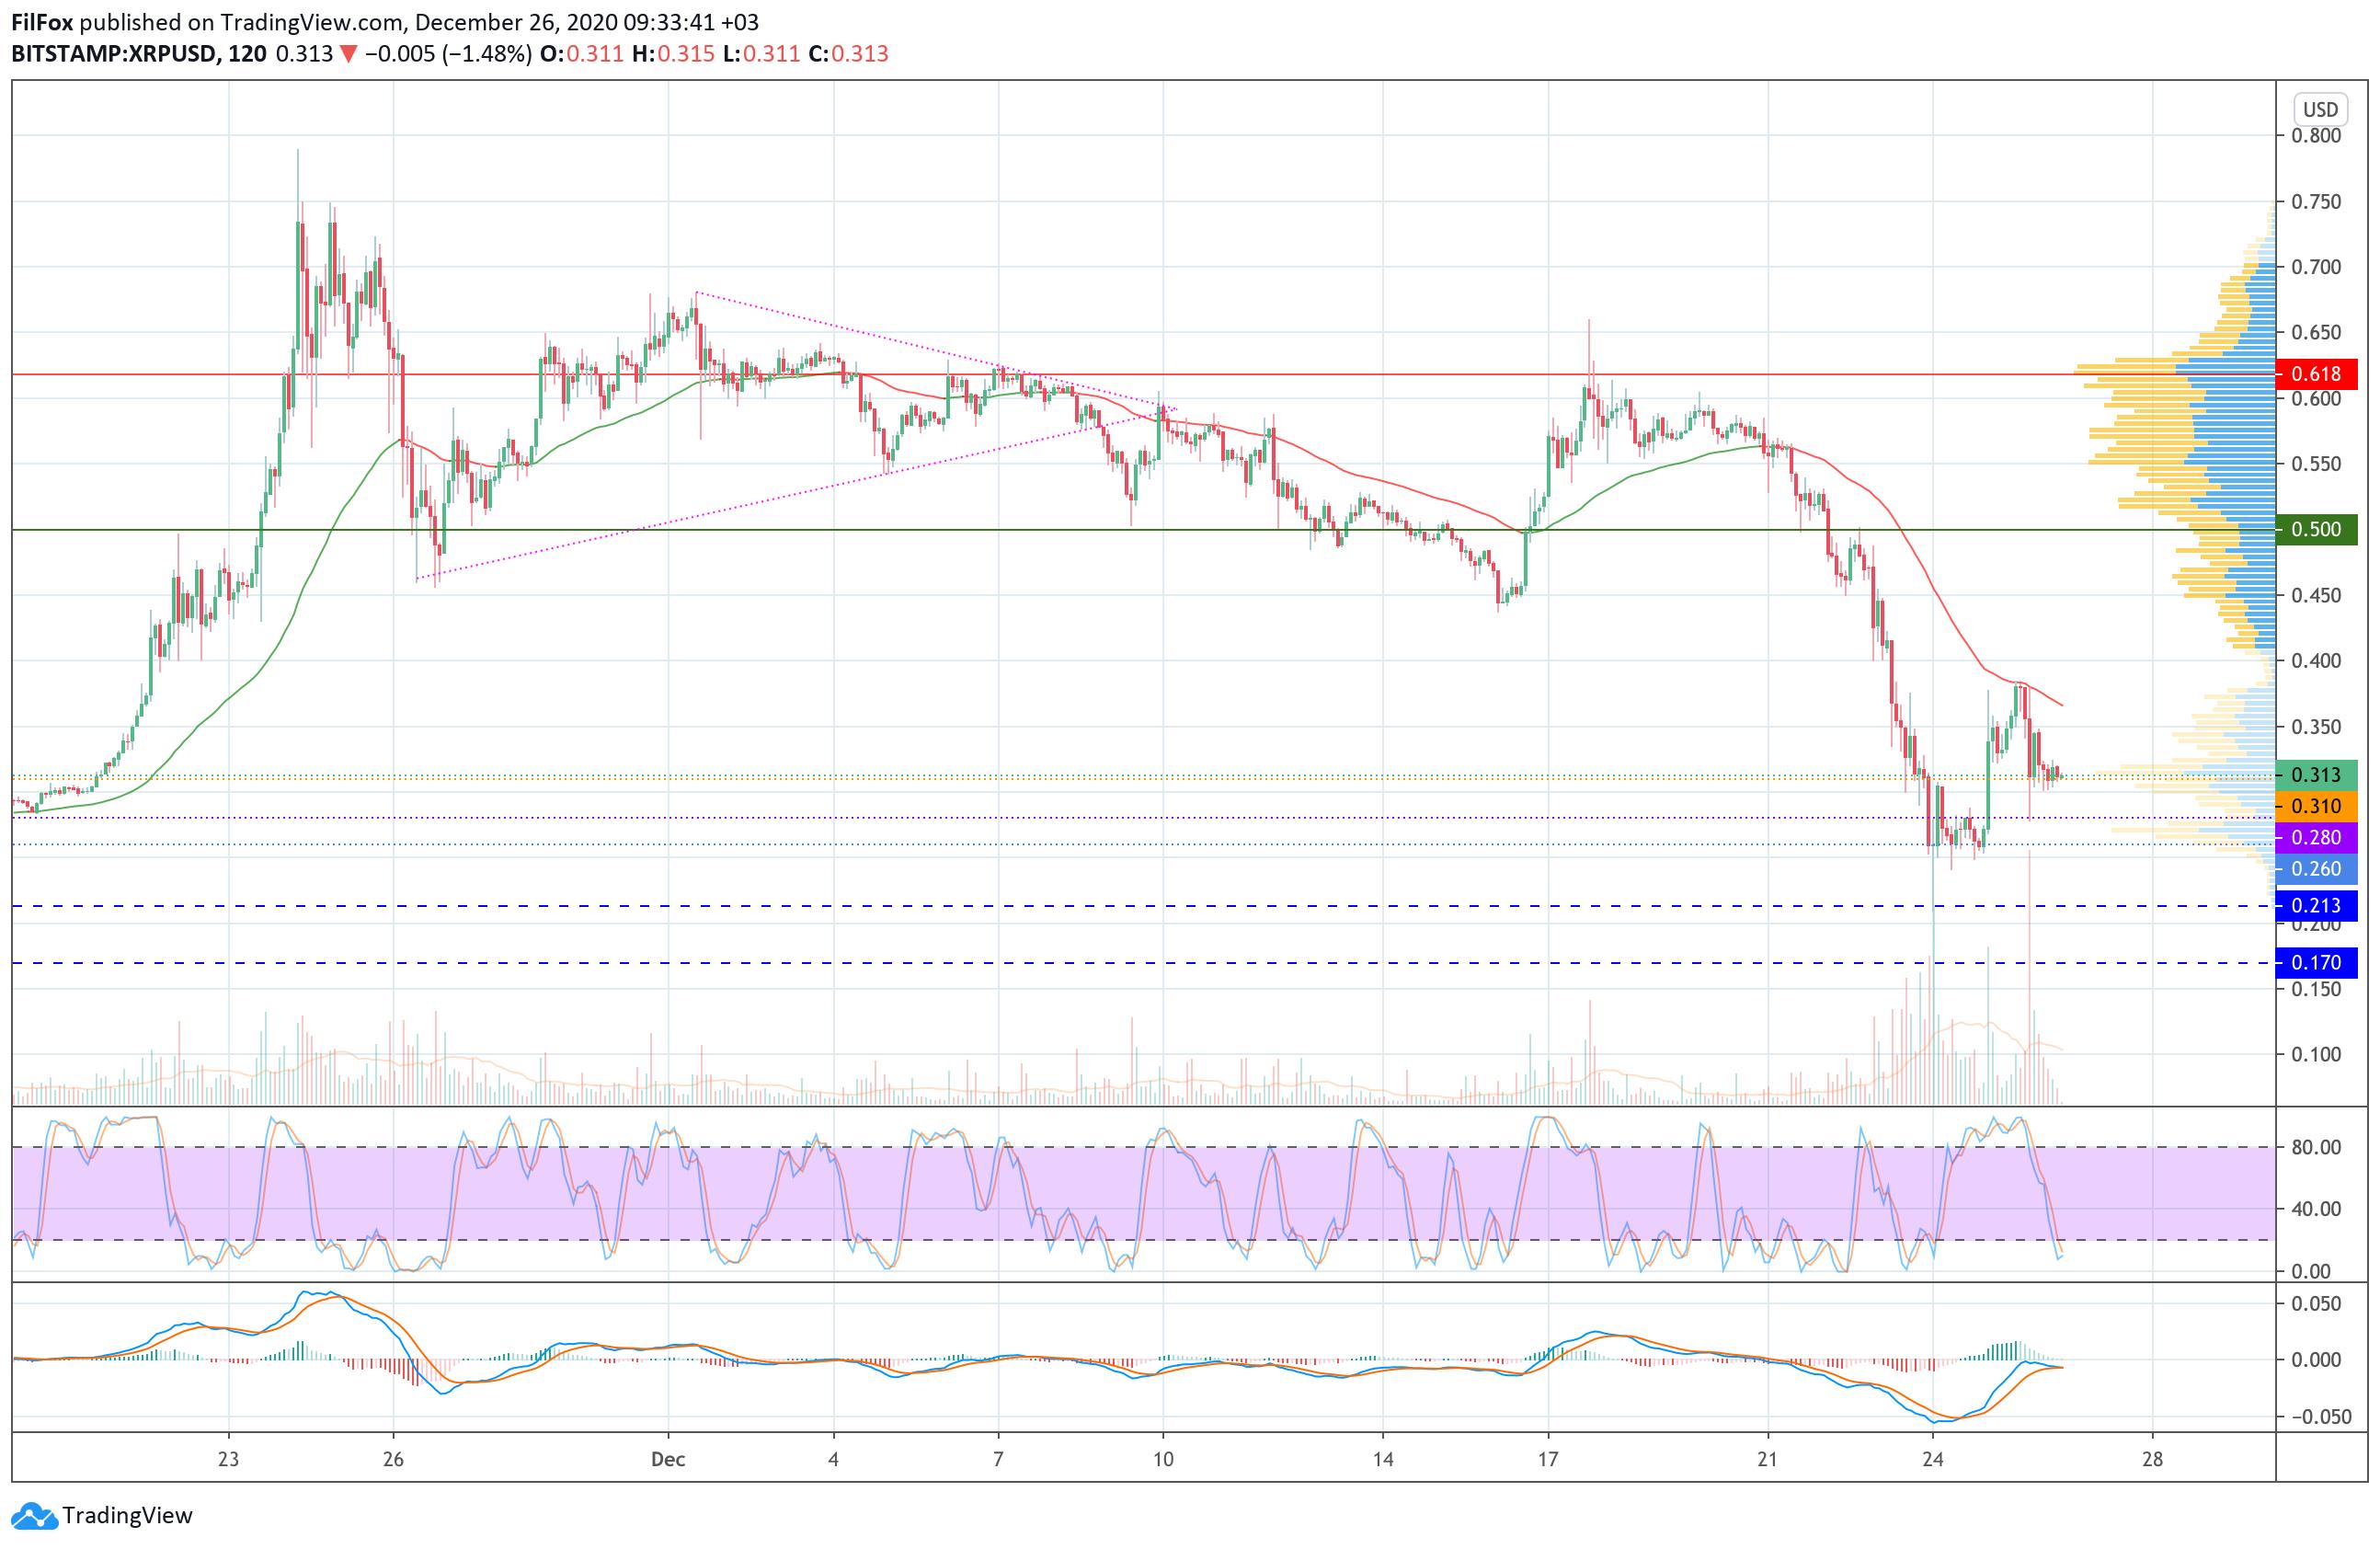 Анализ цен Bitcoin, Ethereum, Ripple на 26.12.2020